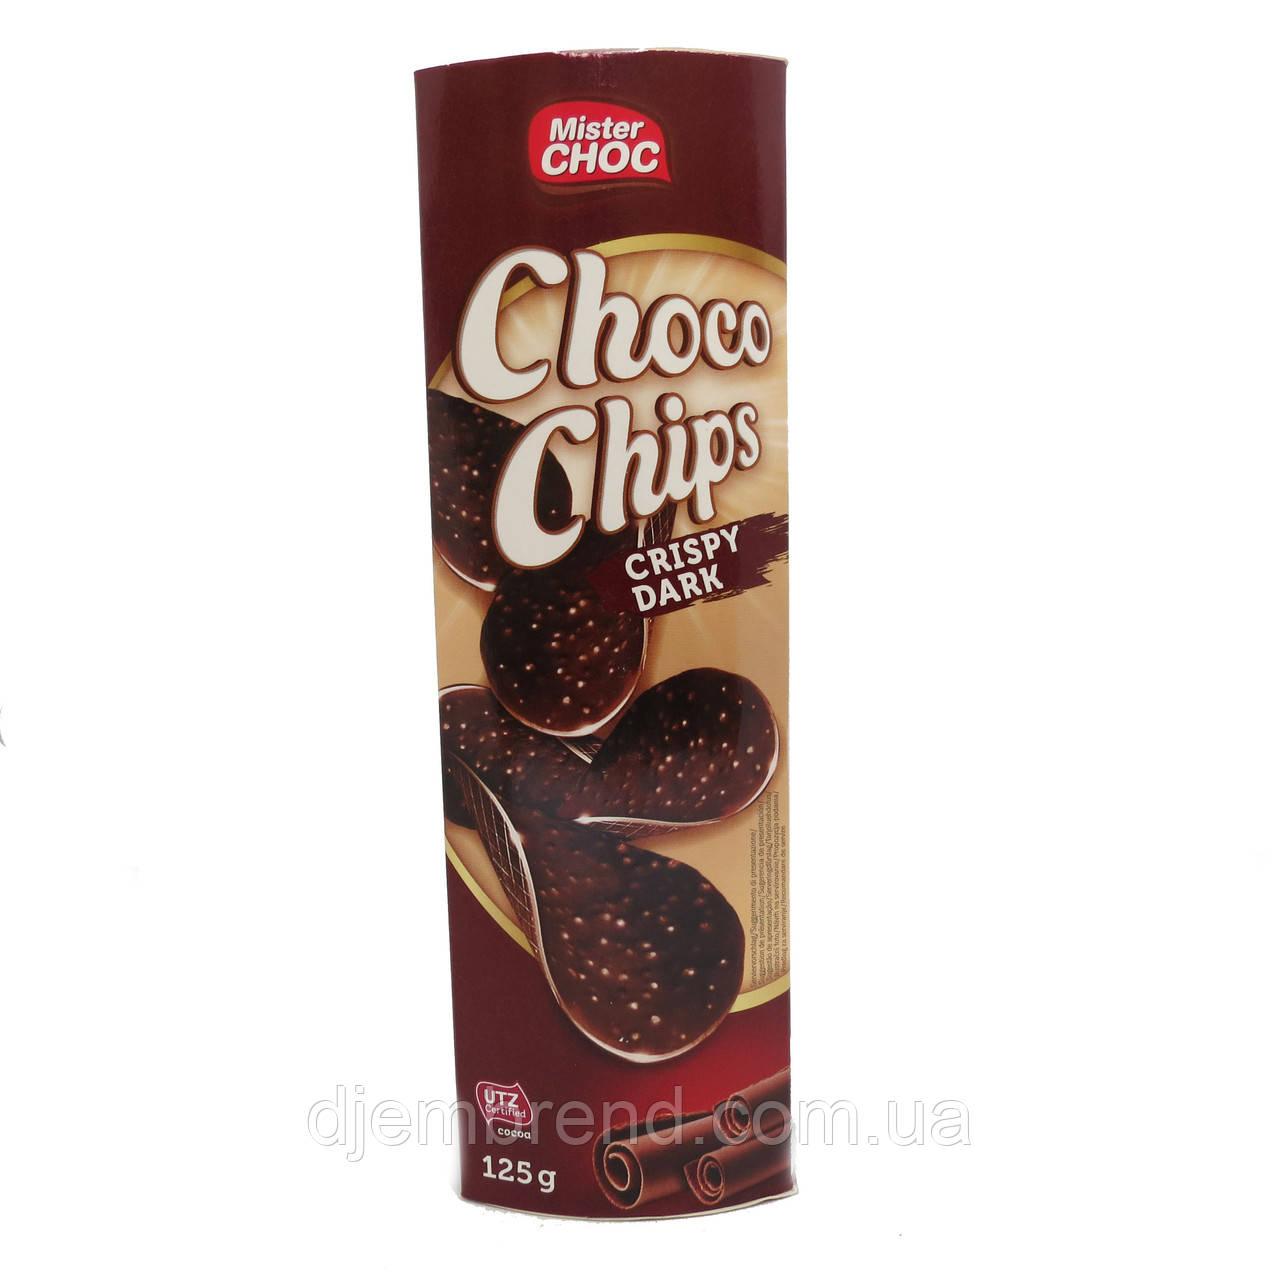 Шоколадные чипсы Mister Dark Crispy Nuts 125 г